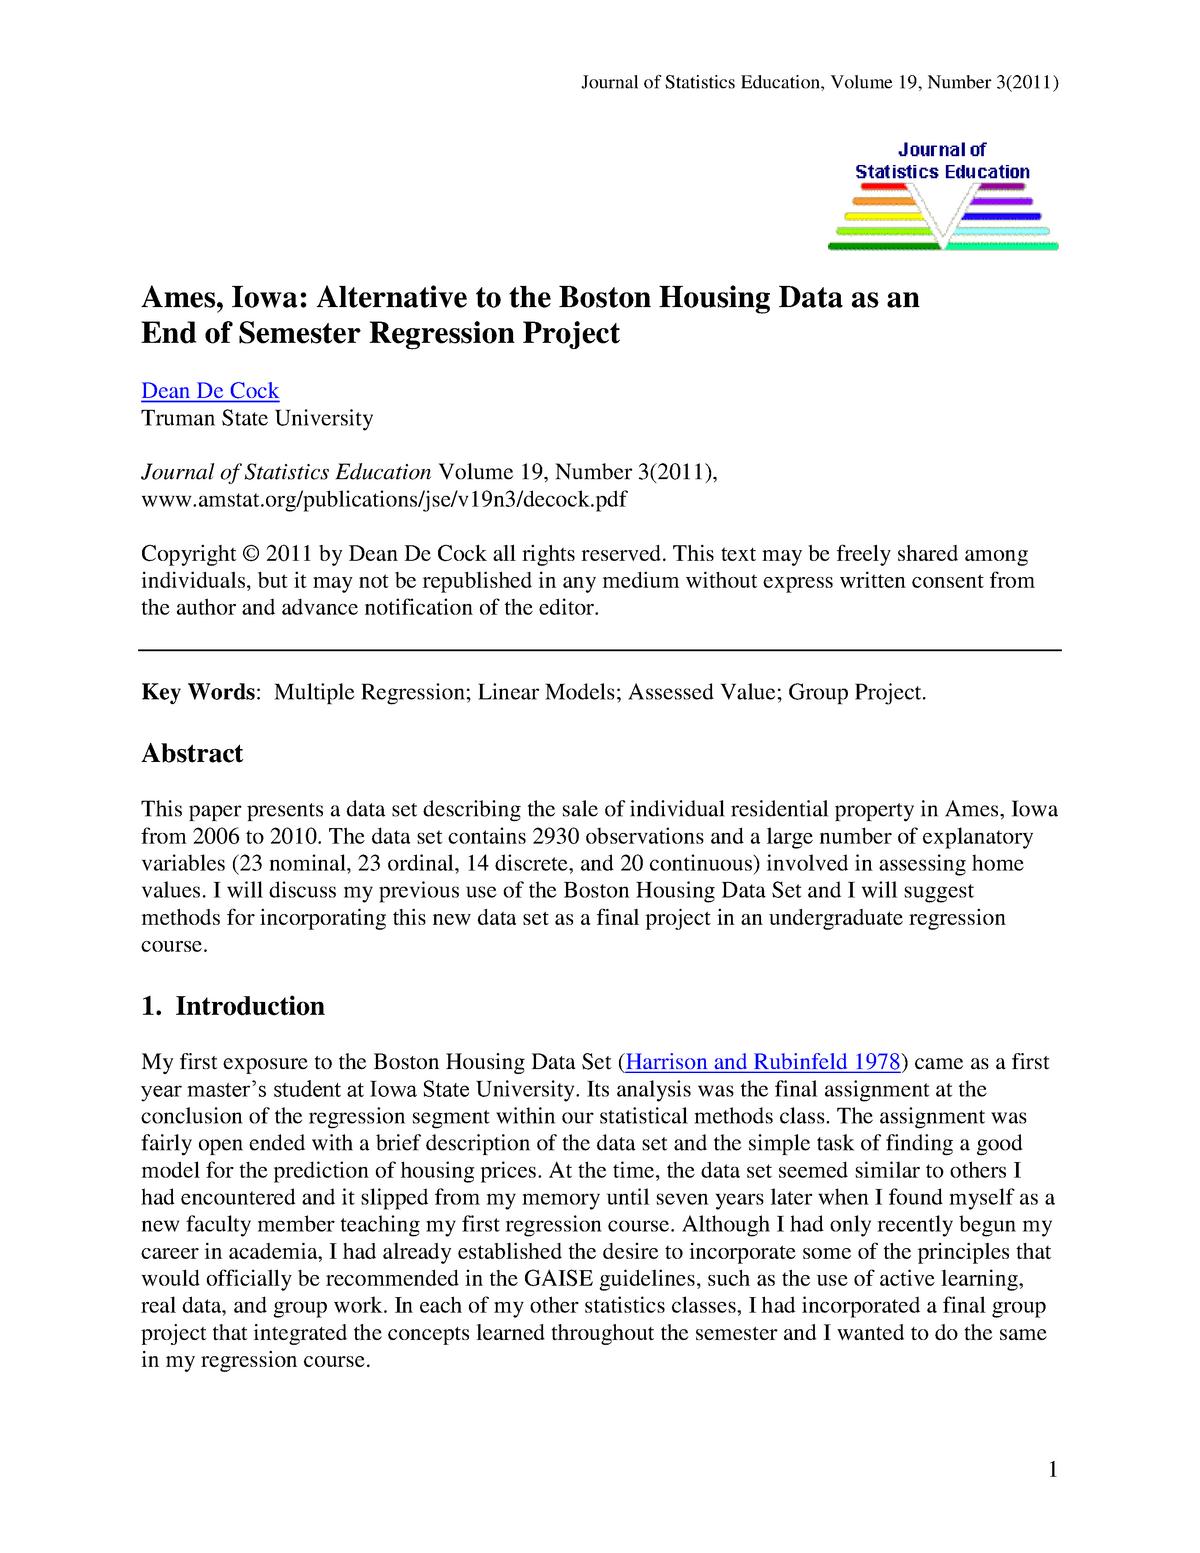 Alternative to the Boston Housing Data - X_400154: Machine